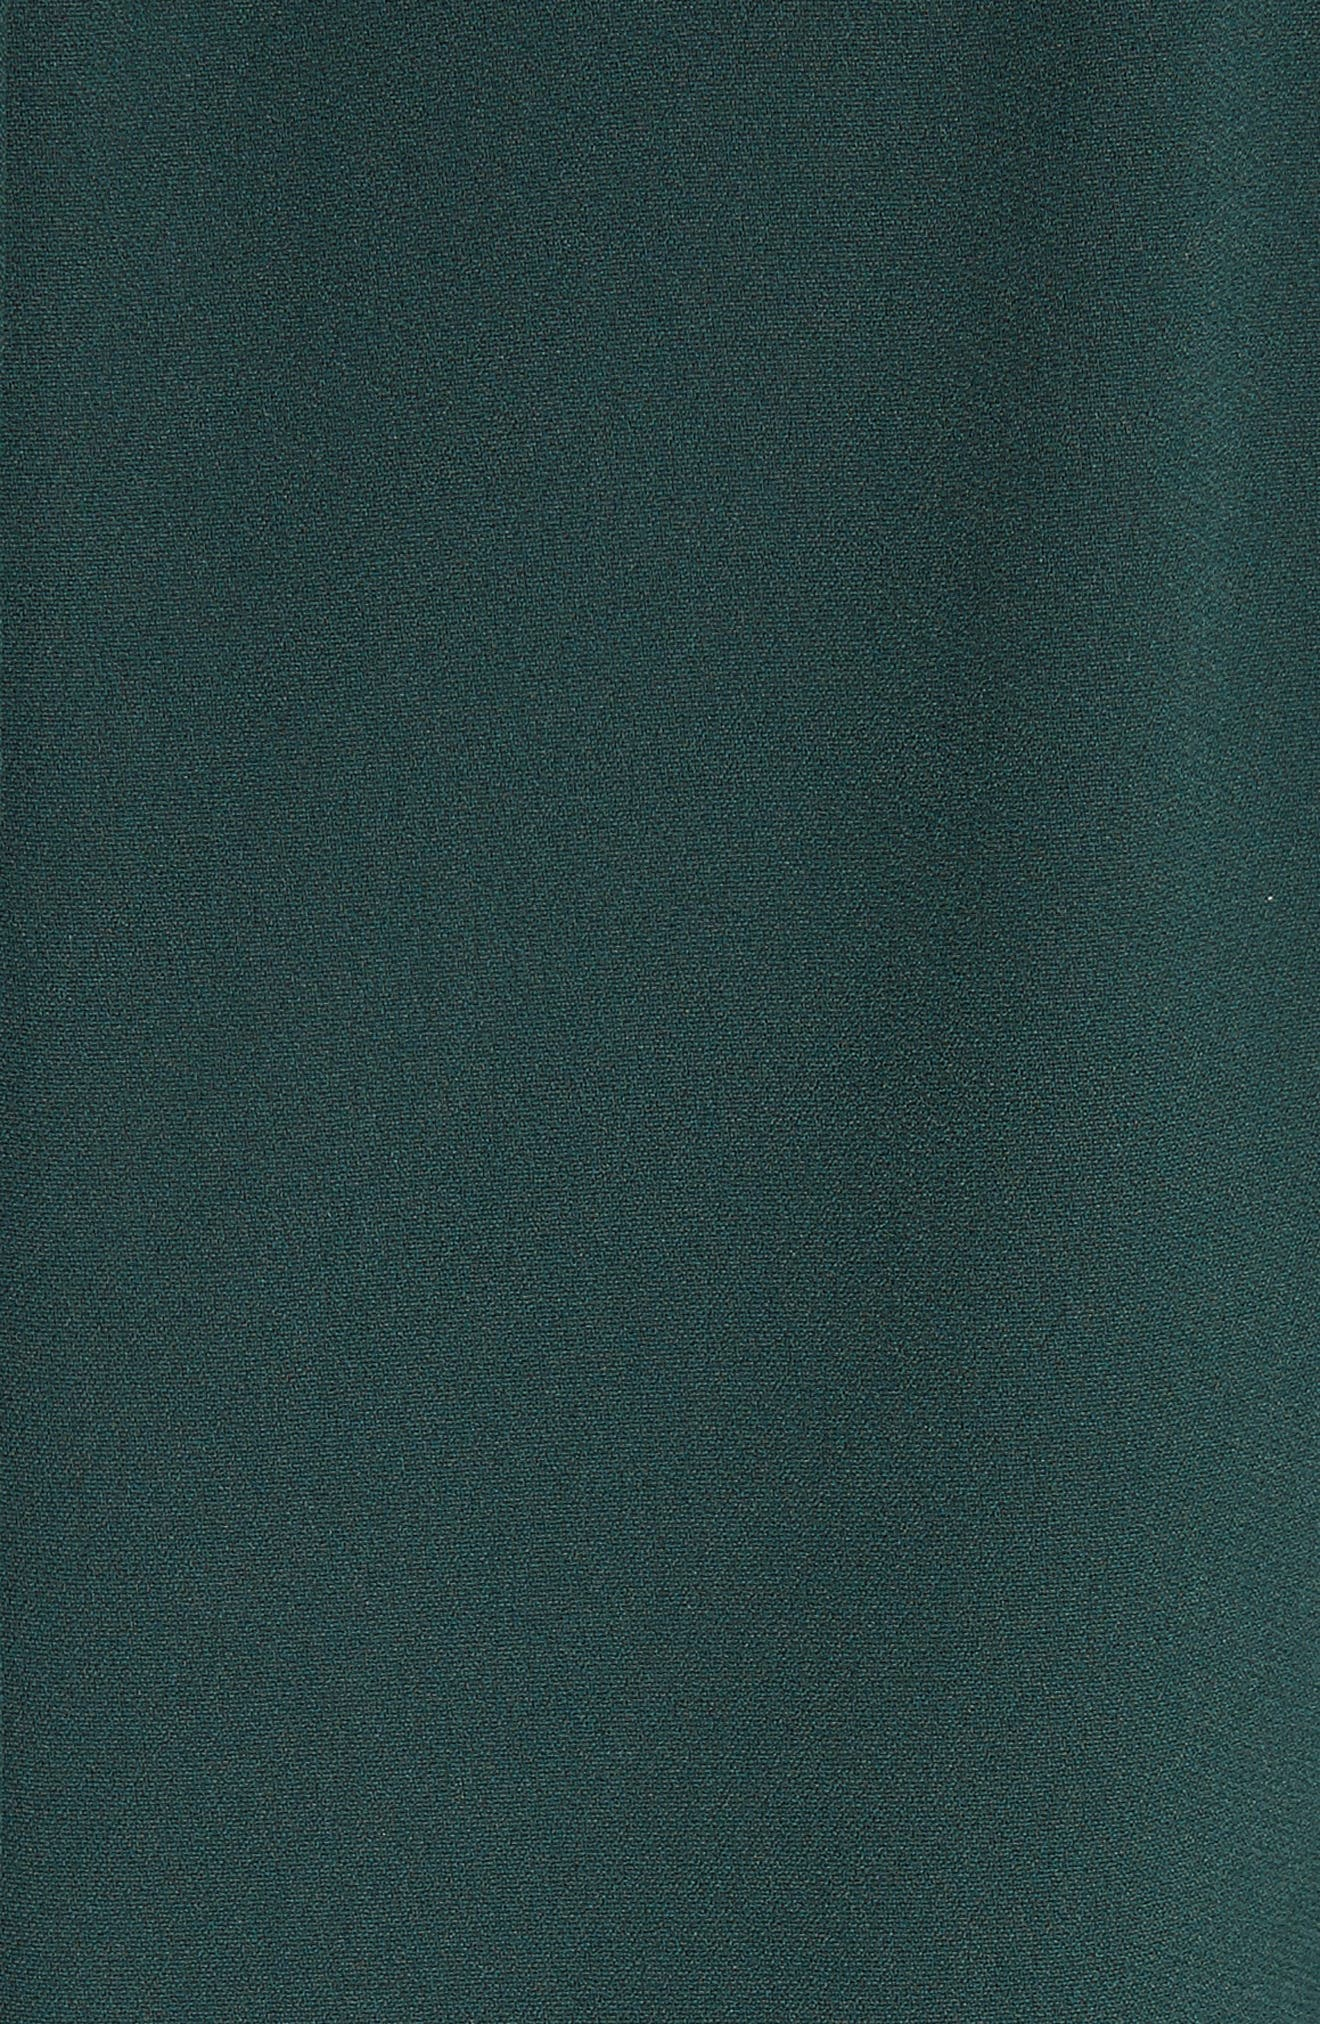 Button Trim Ruffle Hem Dress,                             Alternate thumbnail 6, color,                             Dark Green